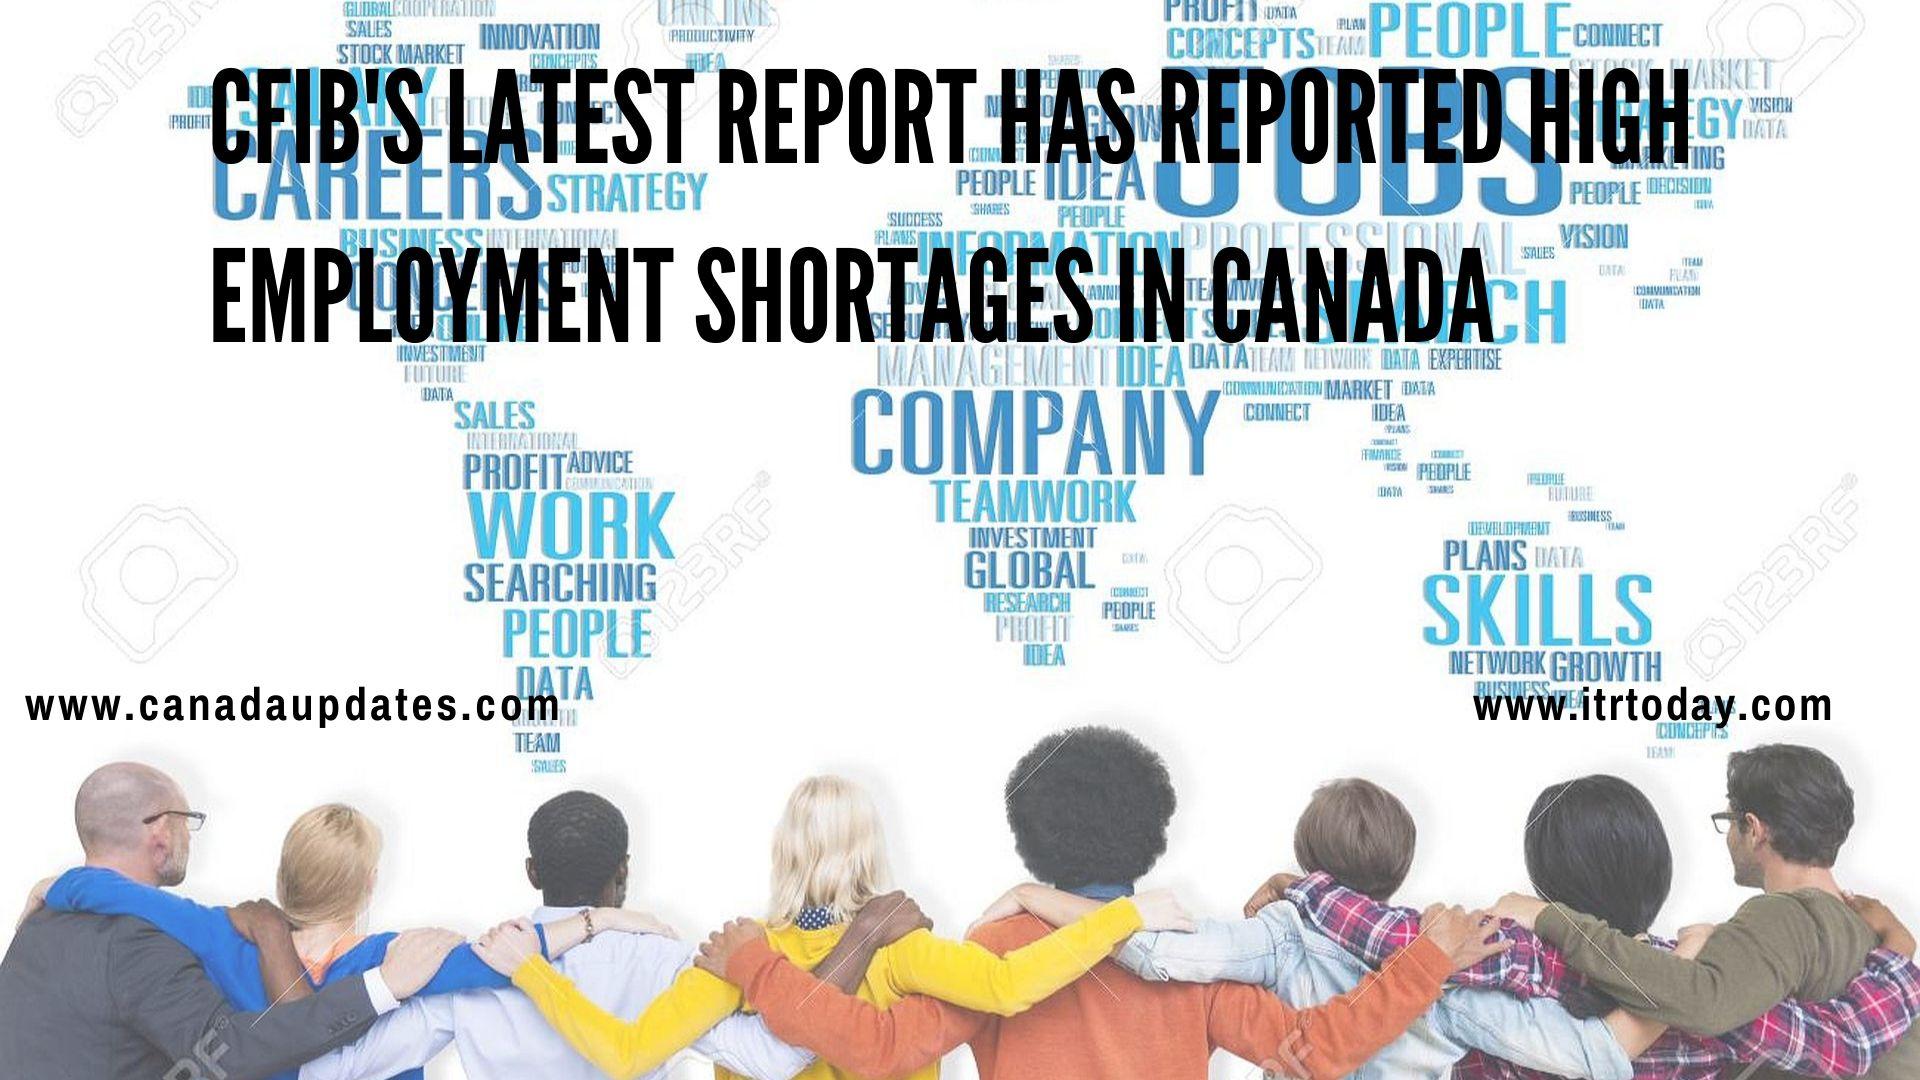 promising Jobs in Canada3.2